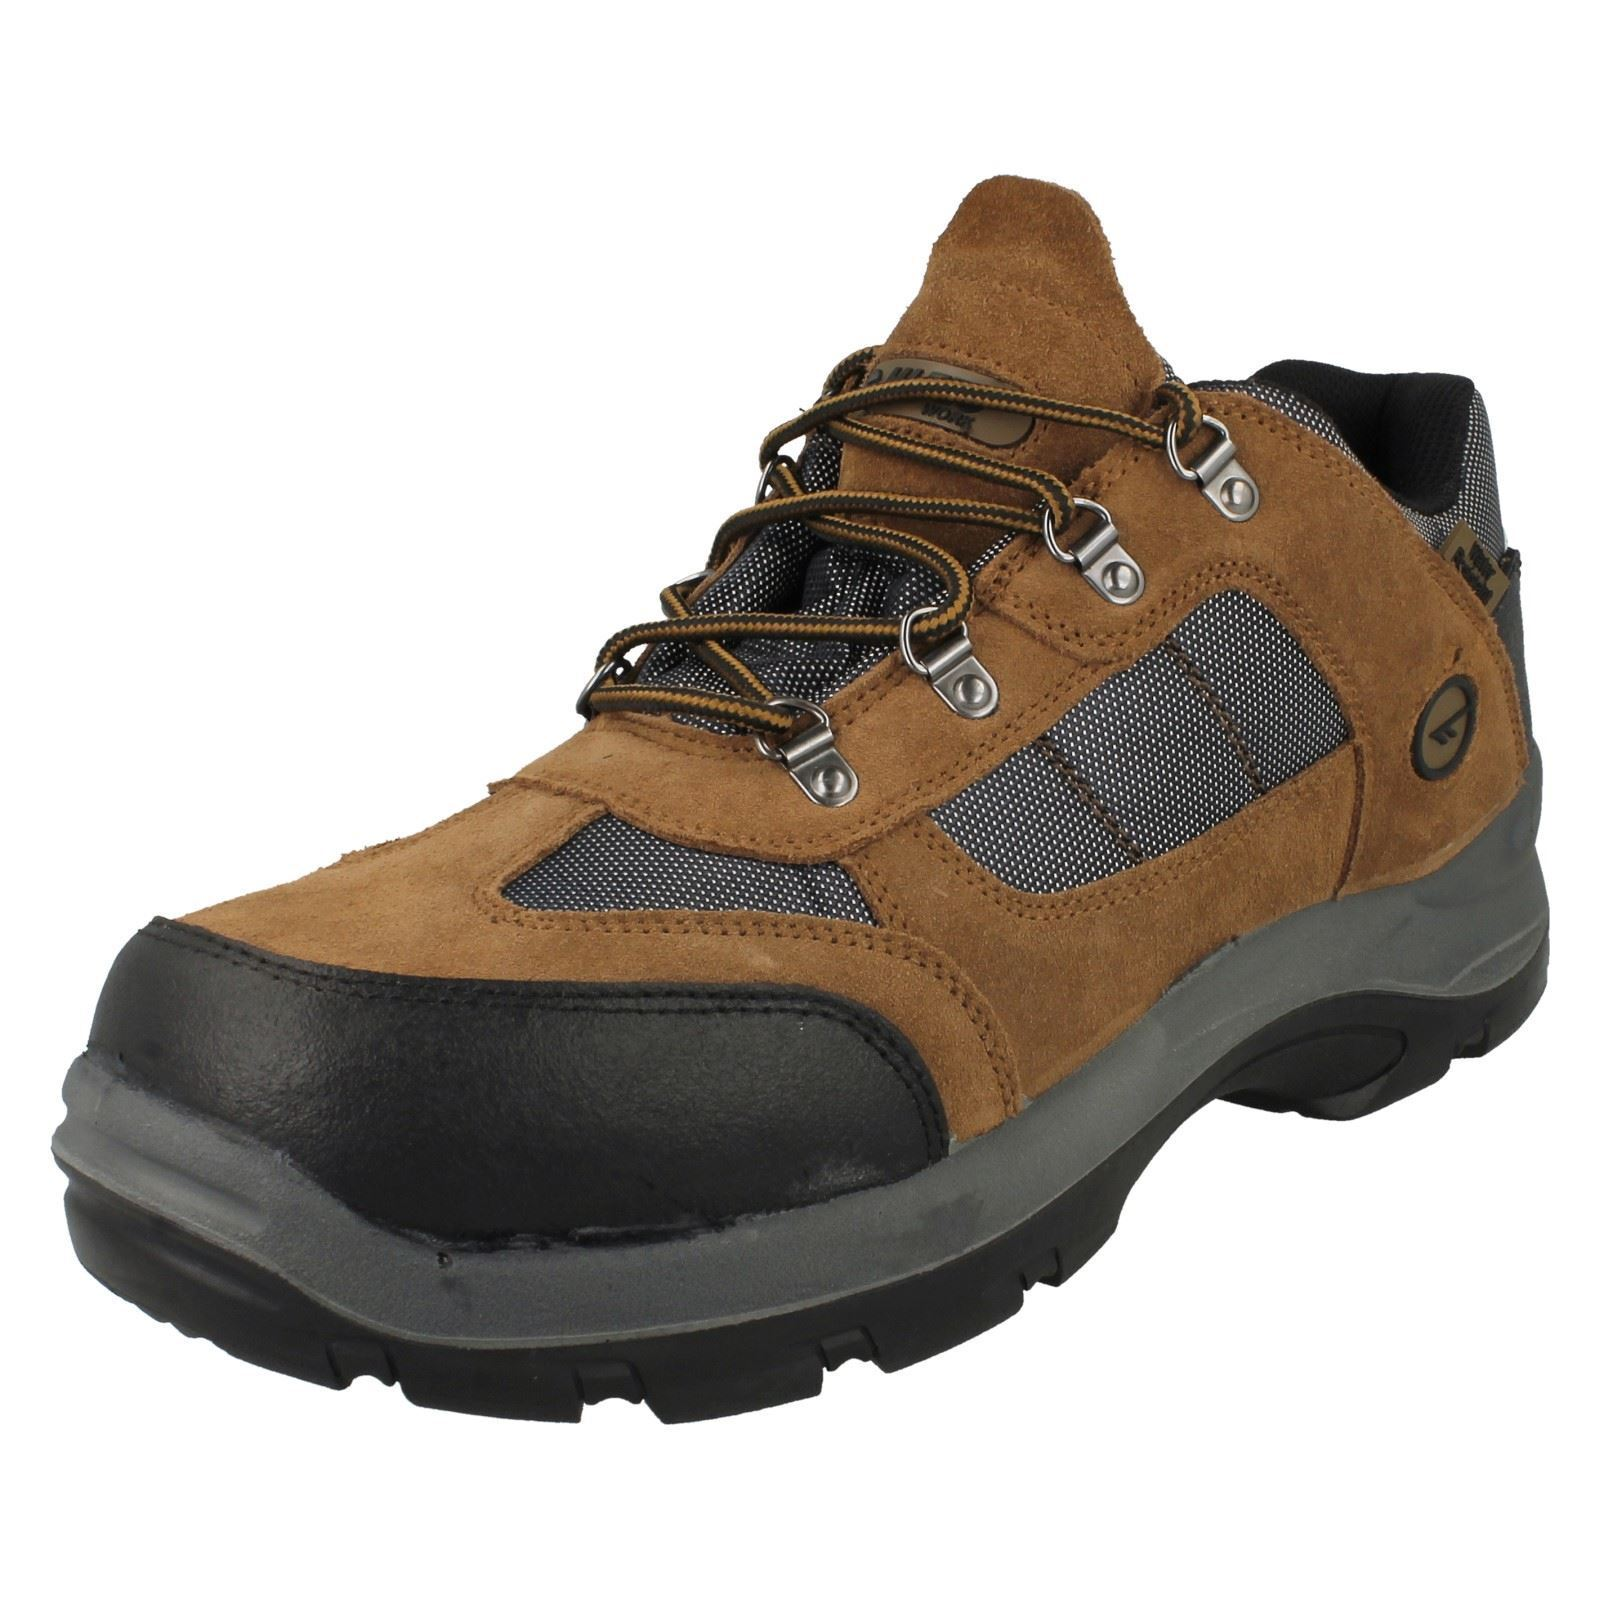 Mens Hi-Tec Lace Up Boots Safe *Hike Low*